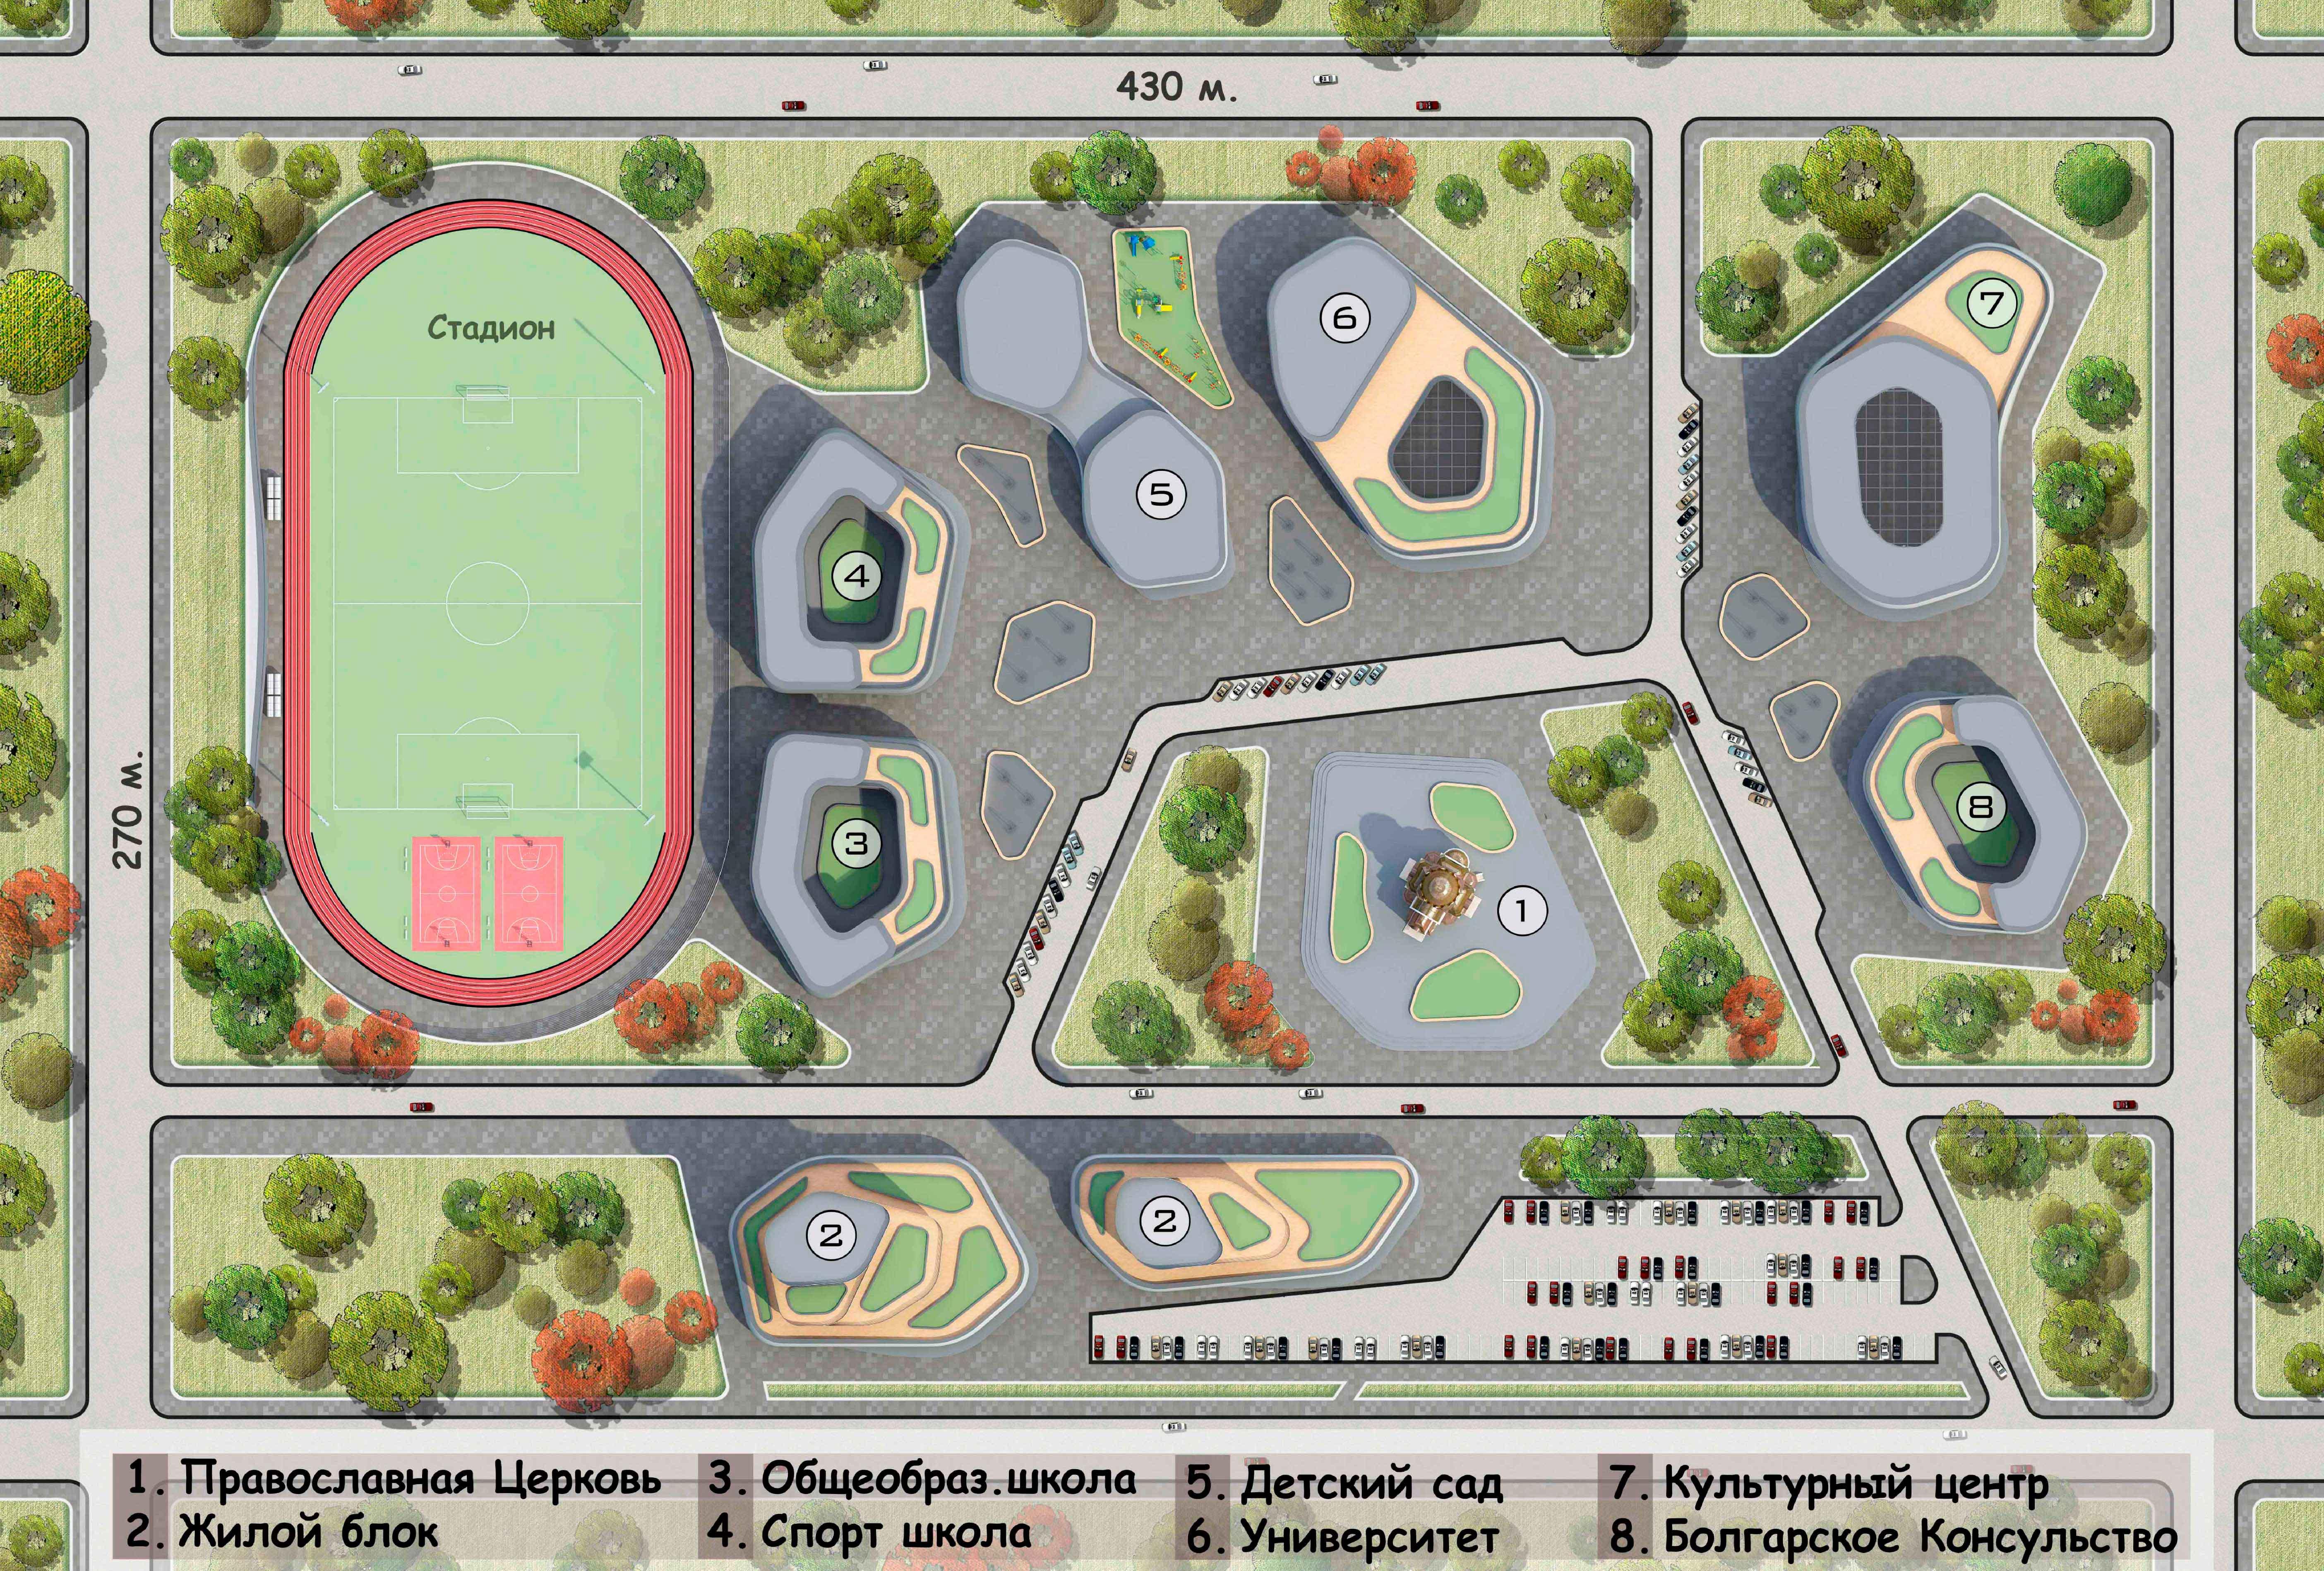 Болгарский-культурный-центр-2